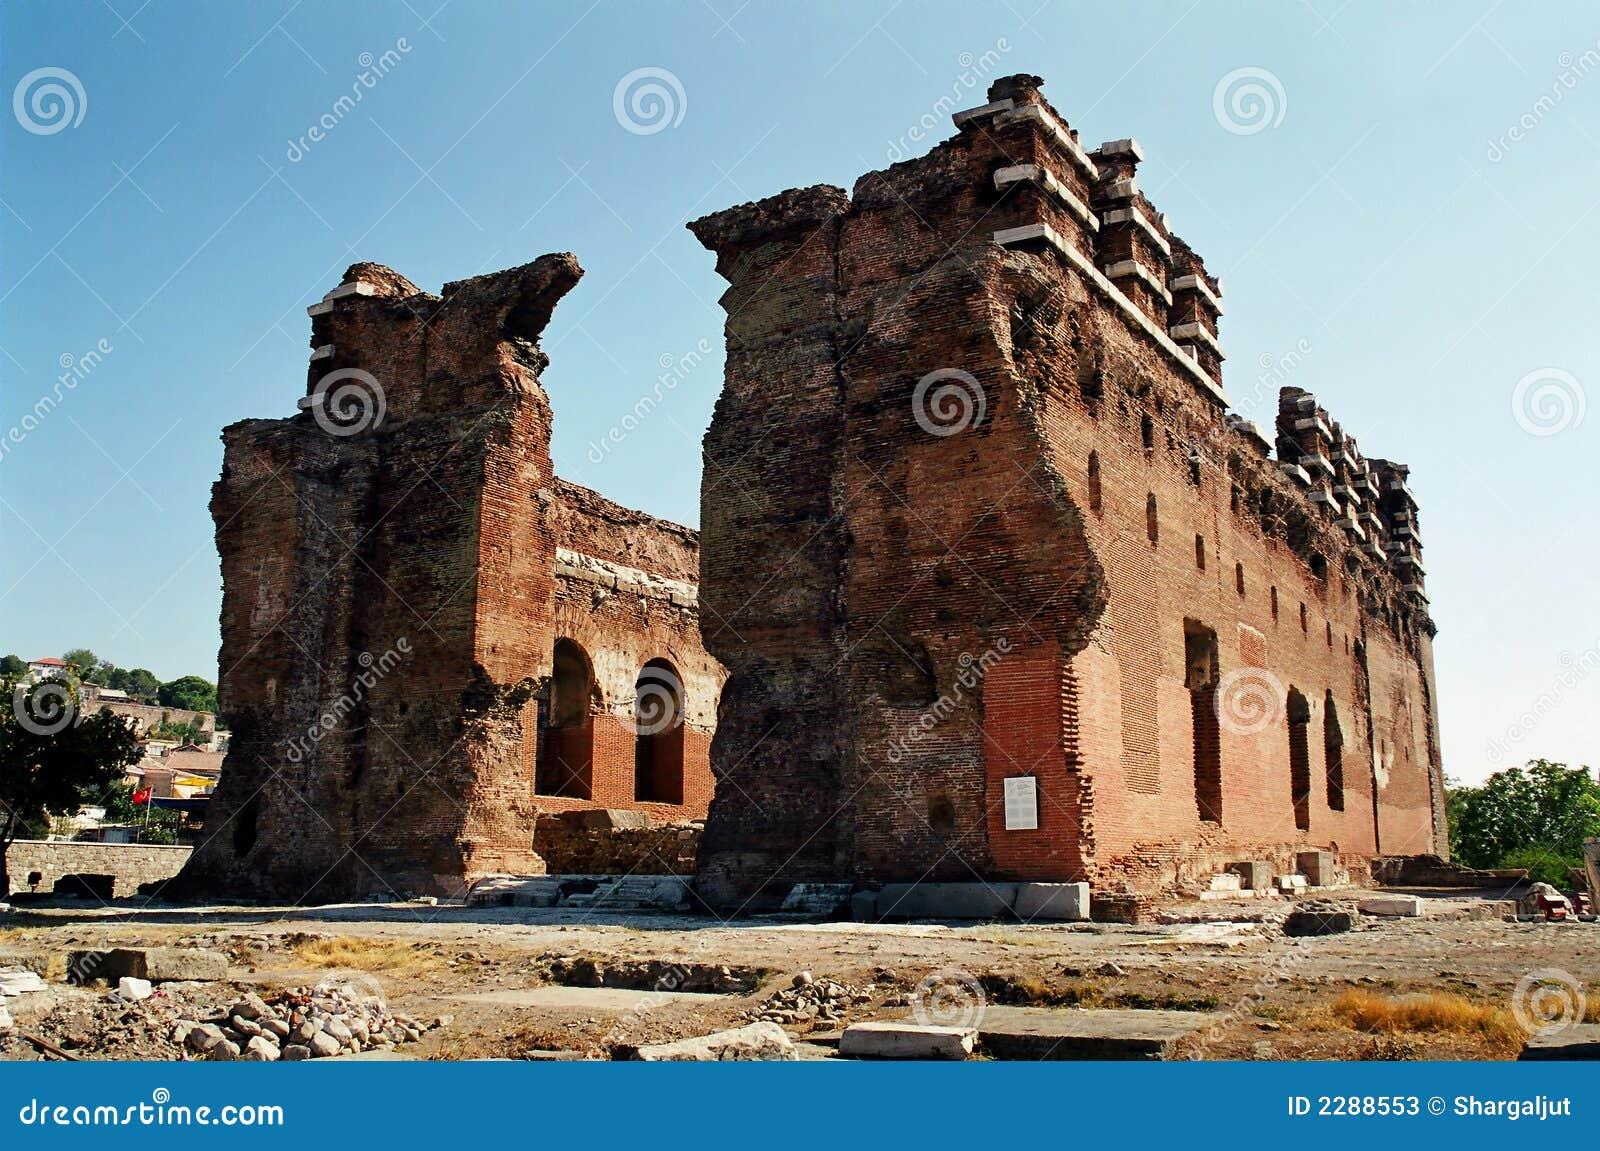 Red Basilica In Bergama Stock Photos - Image: 2288553